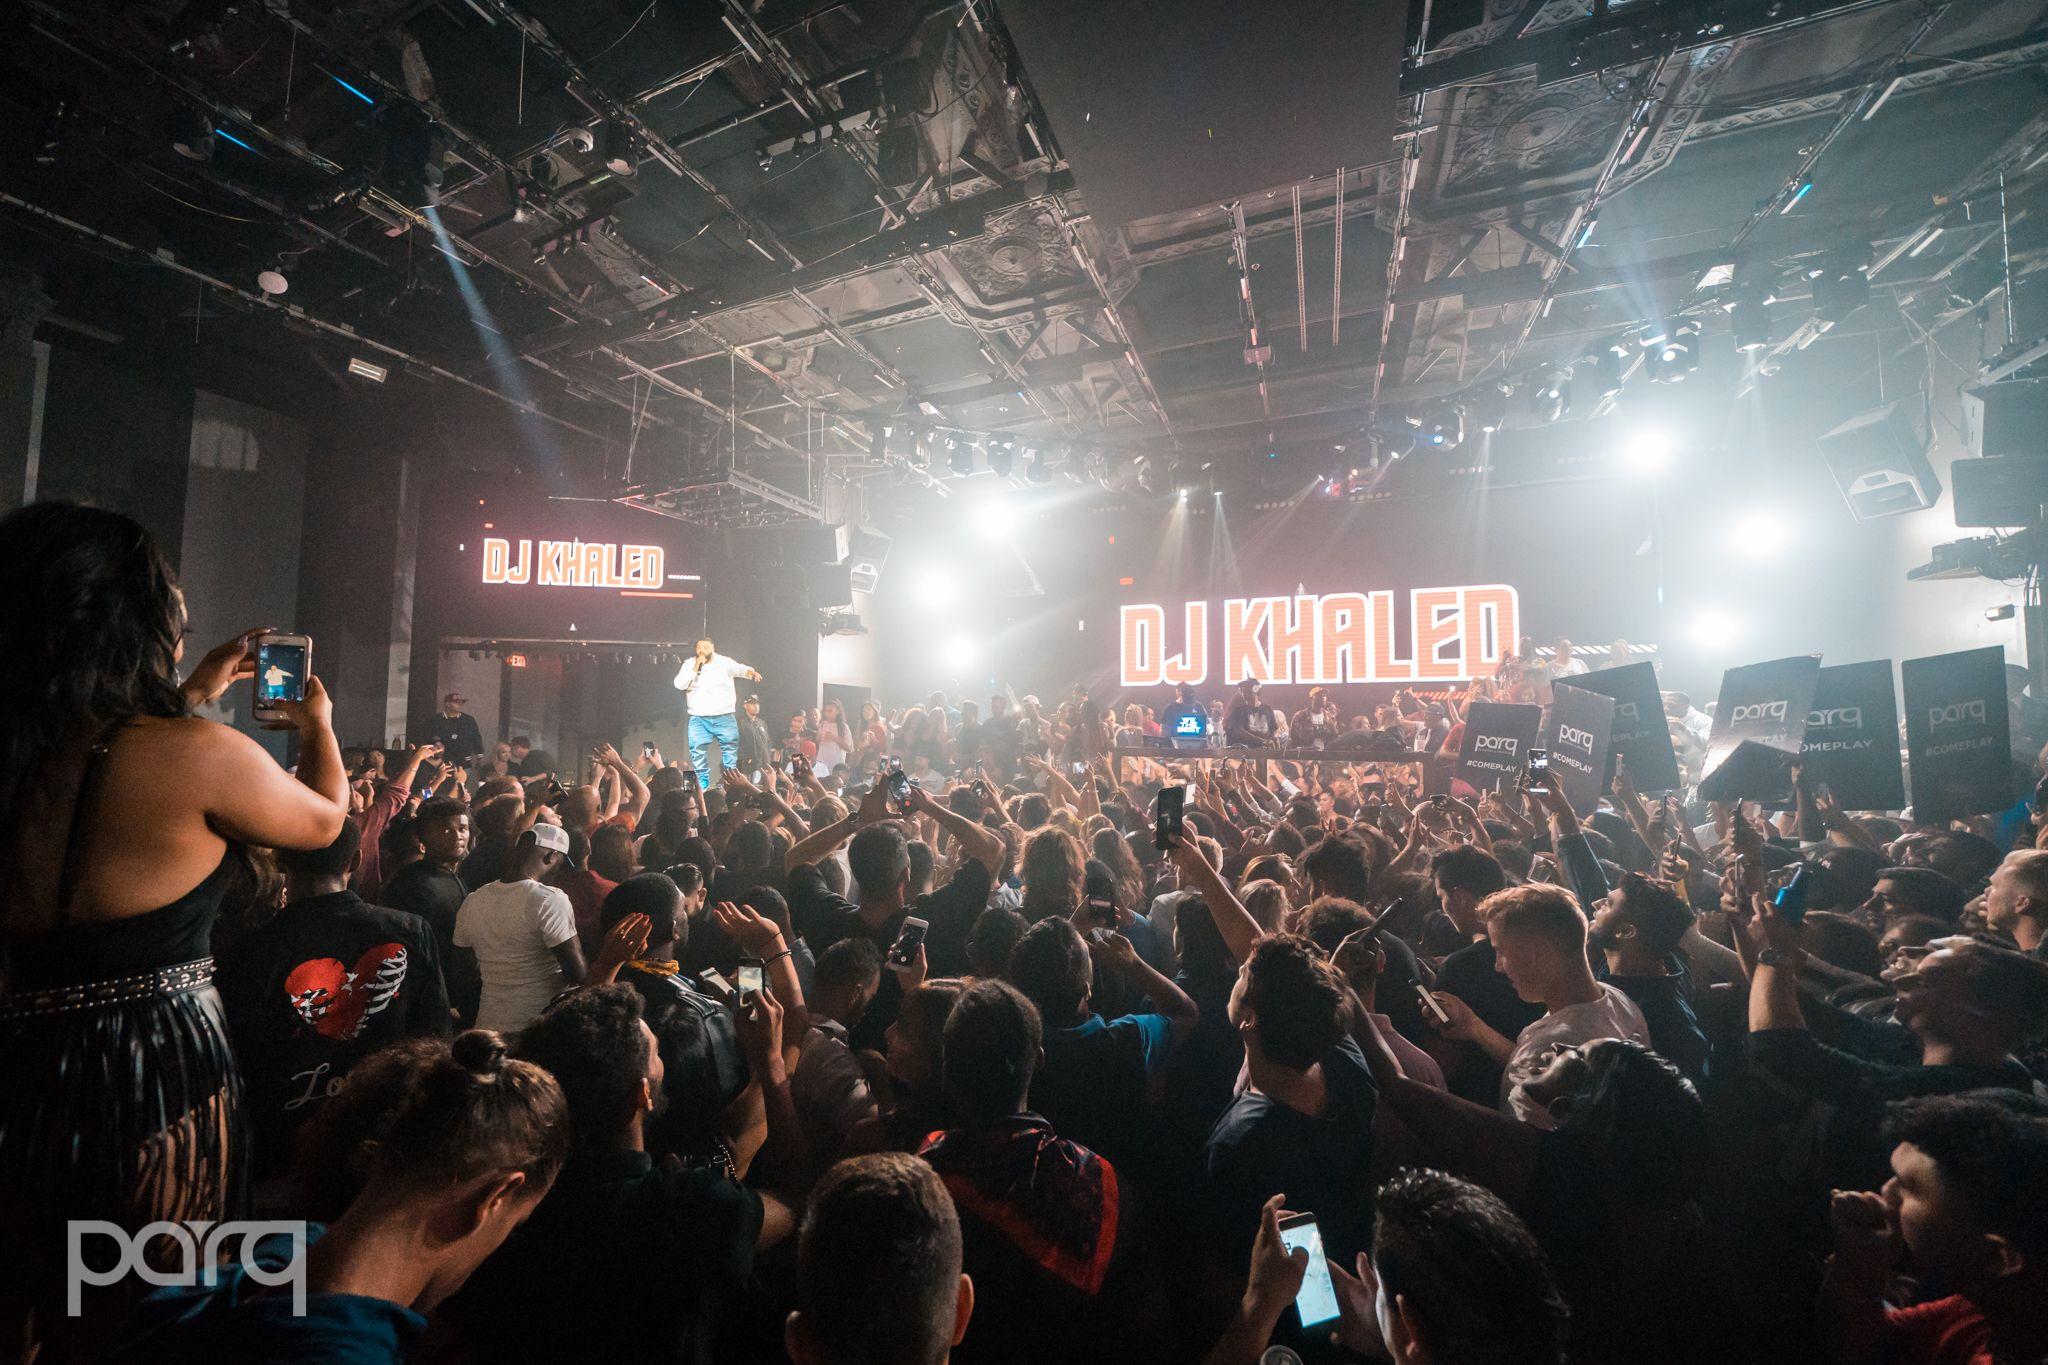 09.27.18 Parq - DJ Khaled-13.jpg